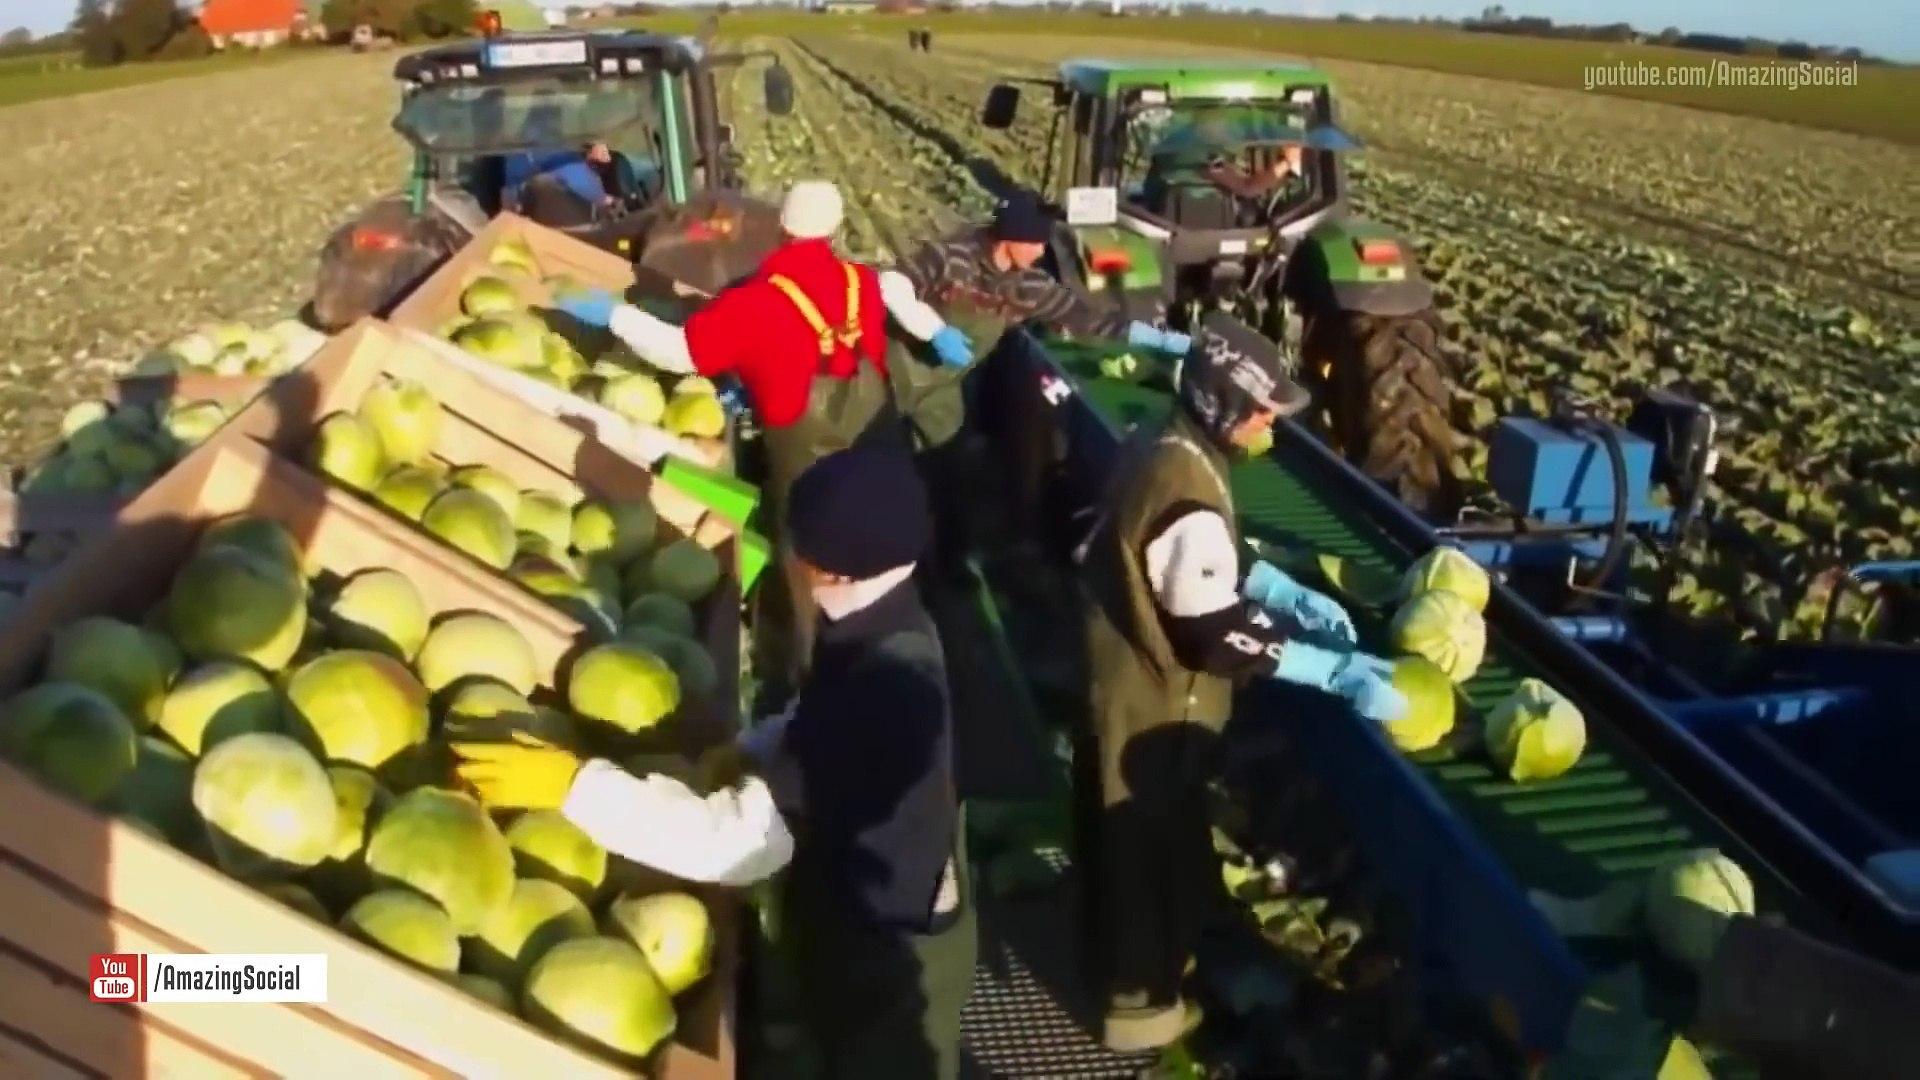 Modern agricultural harvesting machine - Harvesting potatoes, sugar beets